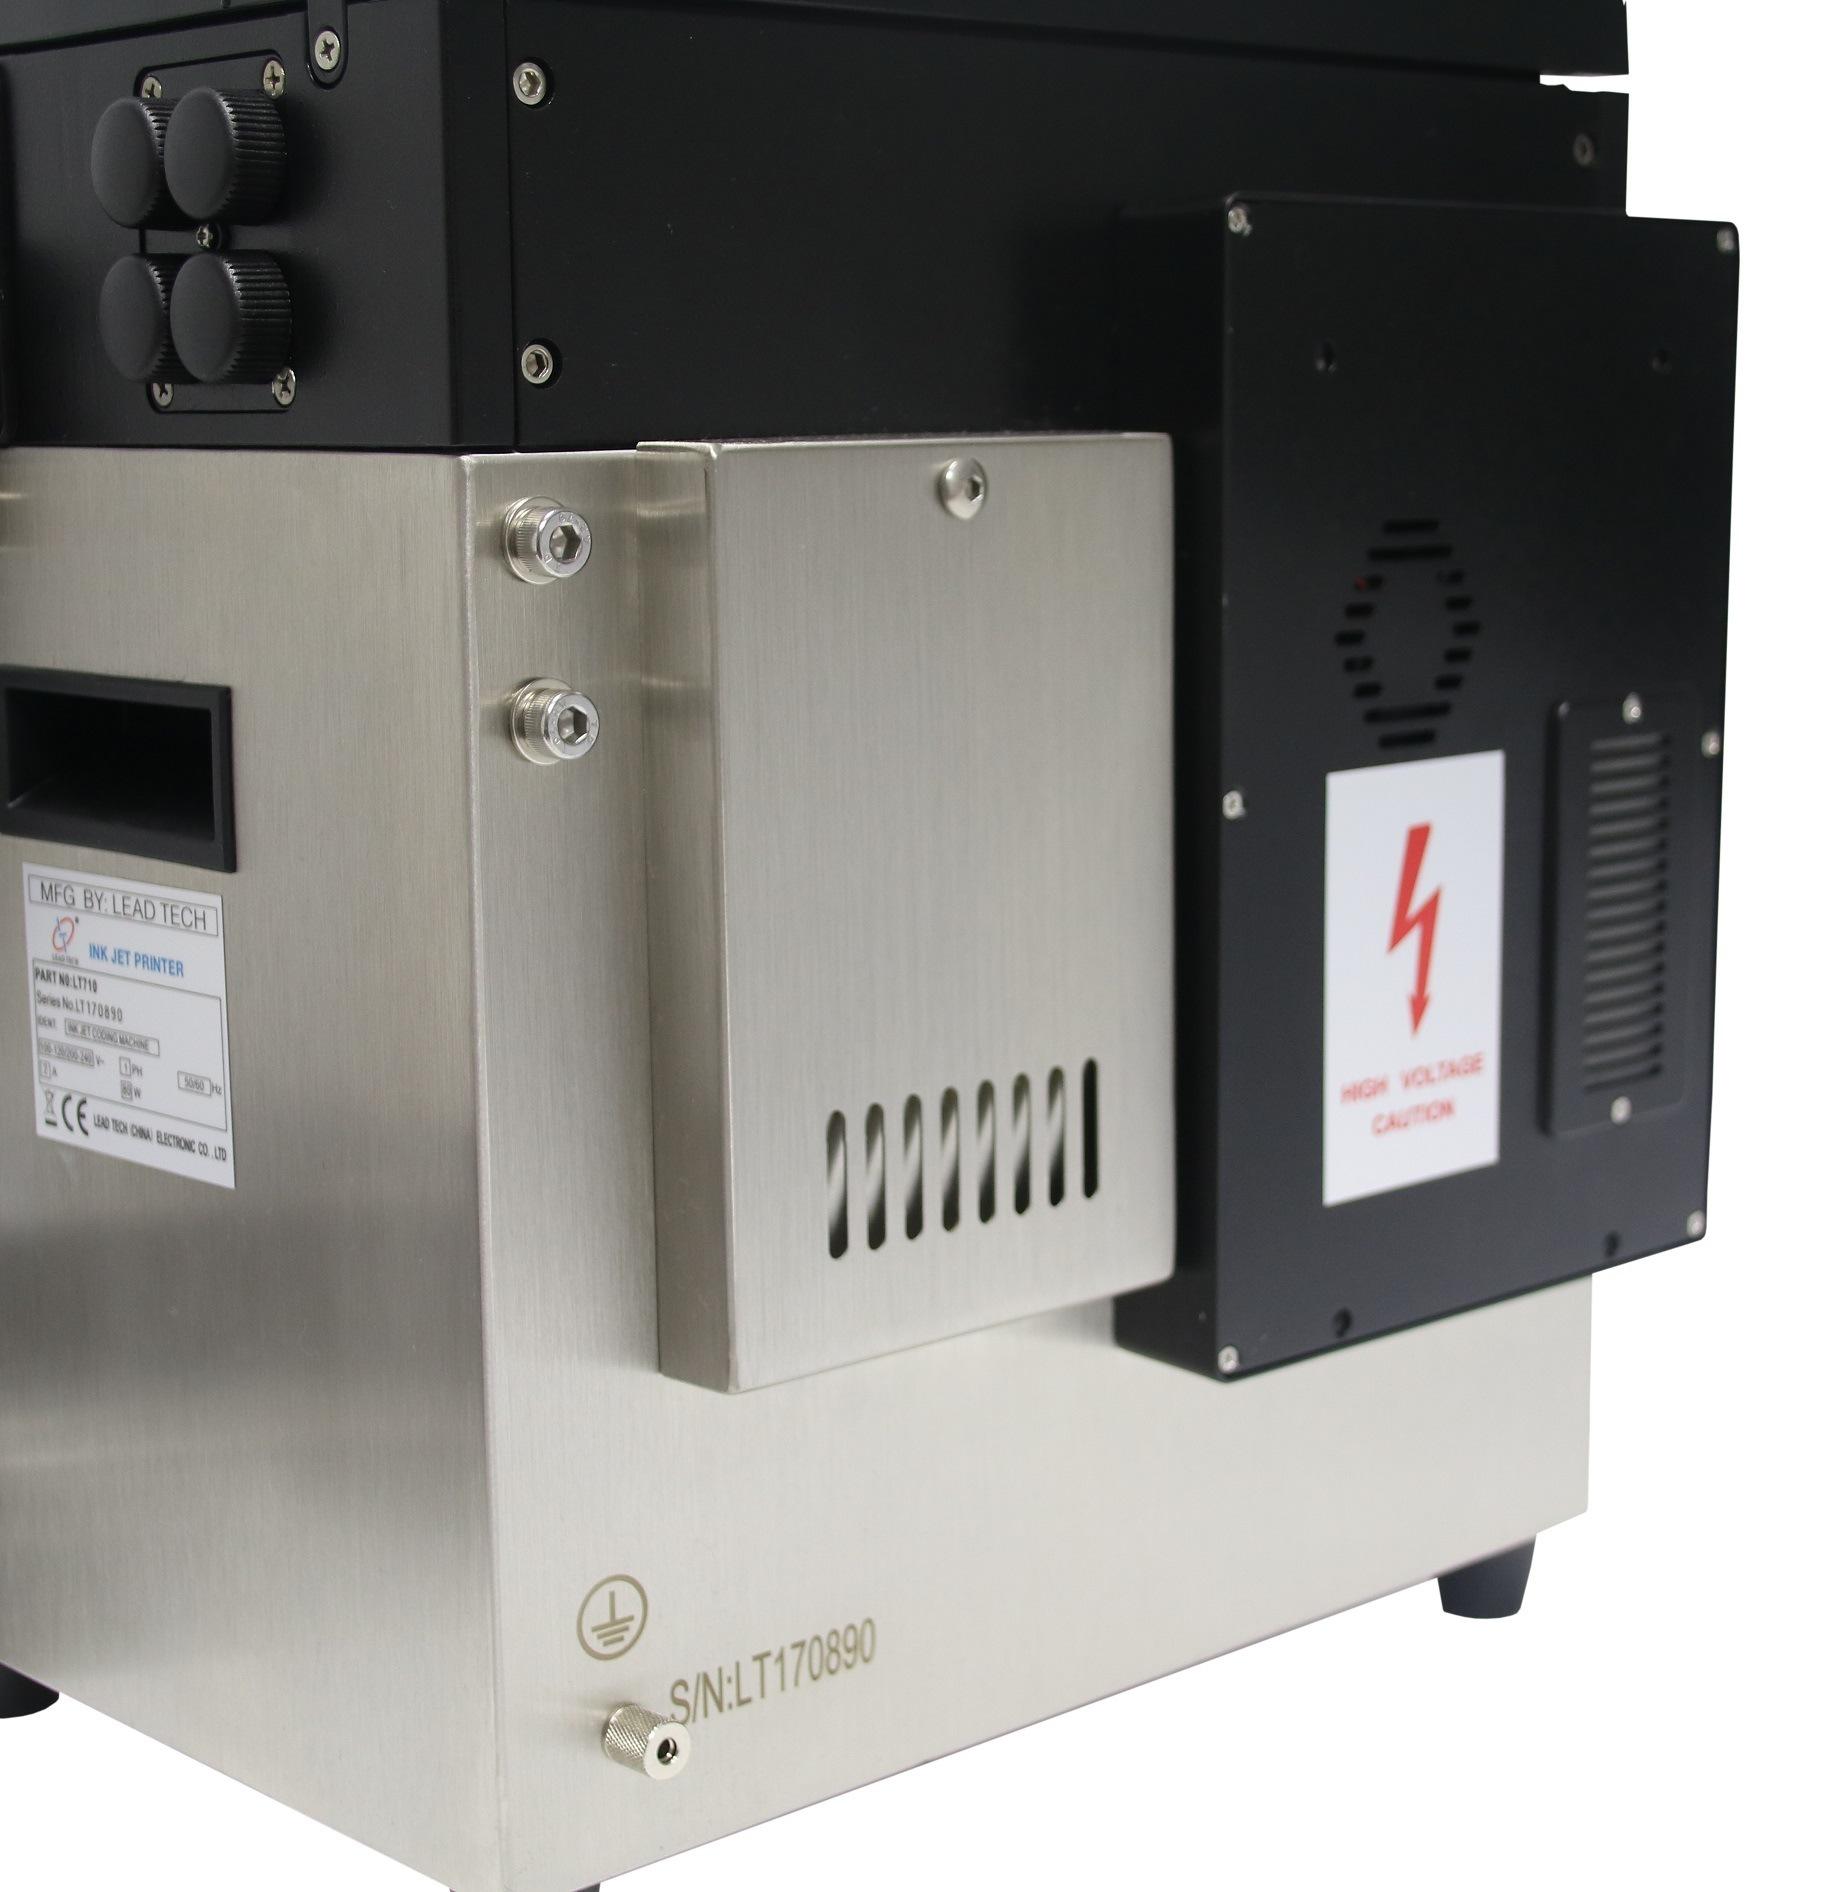 Lead Tech Lt760 Continuous HDPE Coding Inkjet Printer